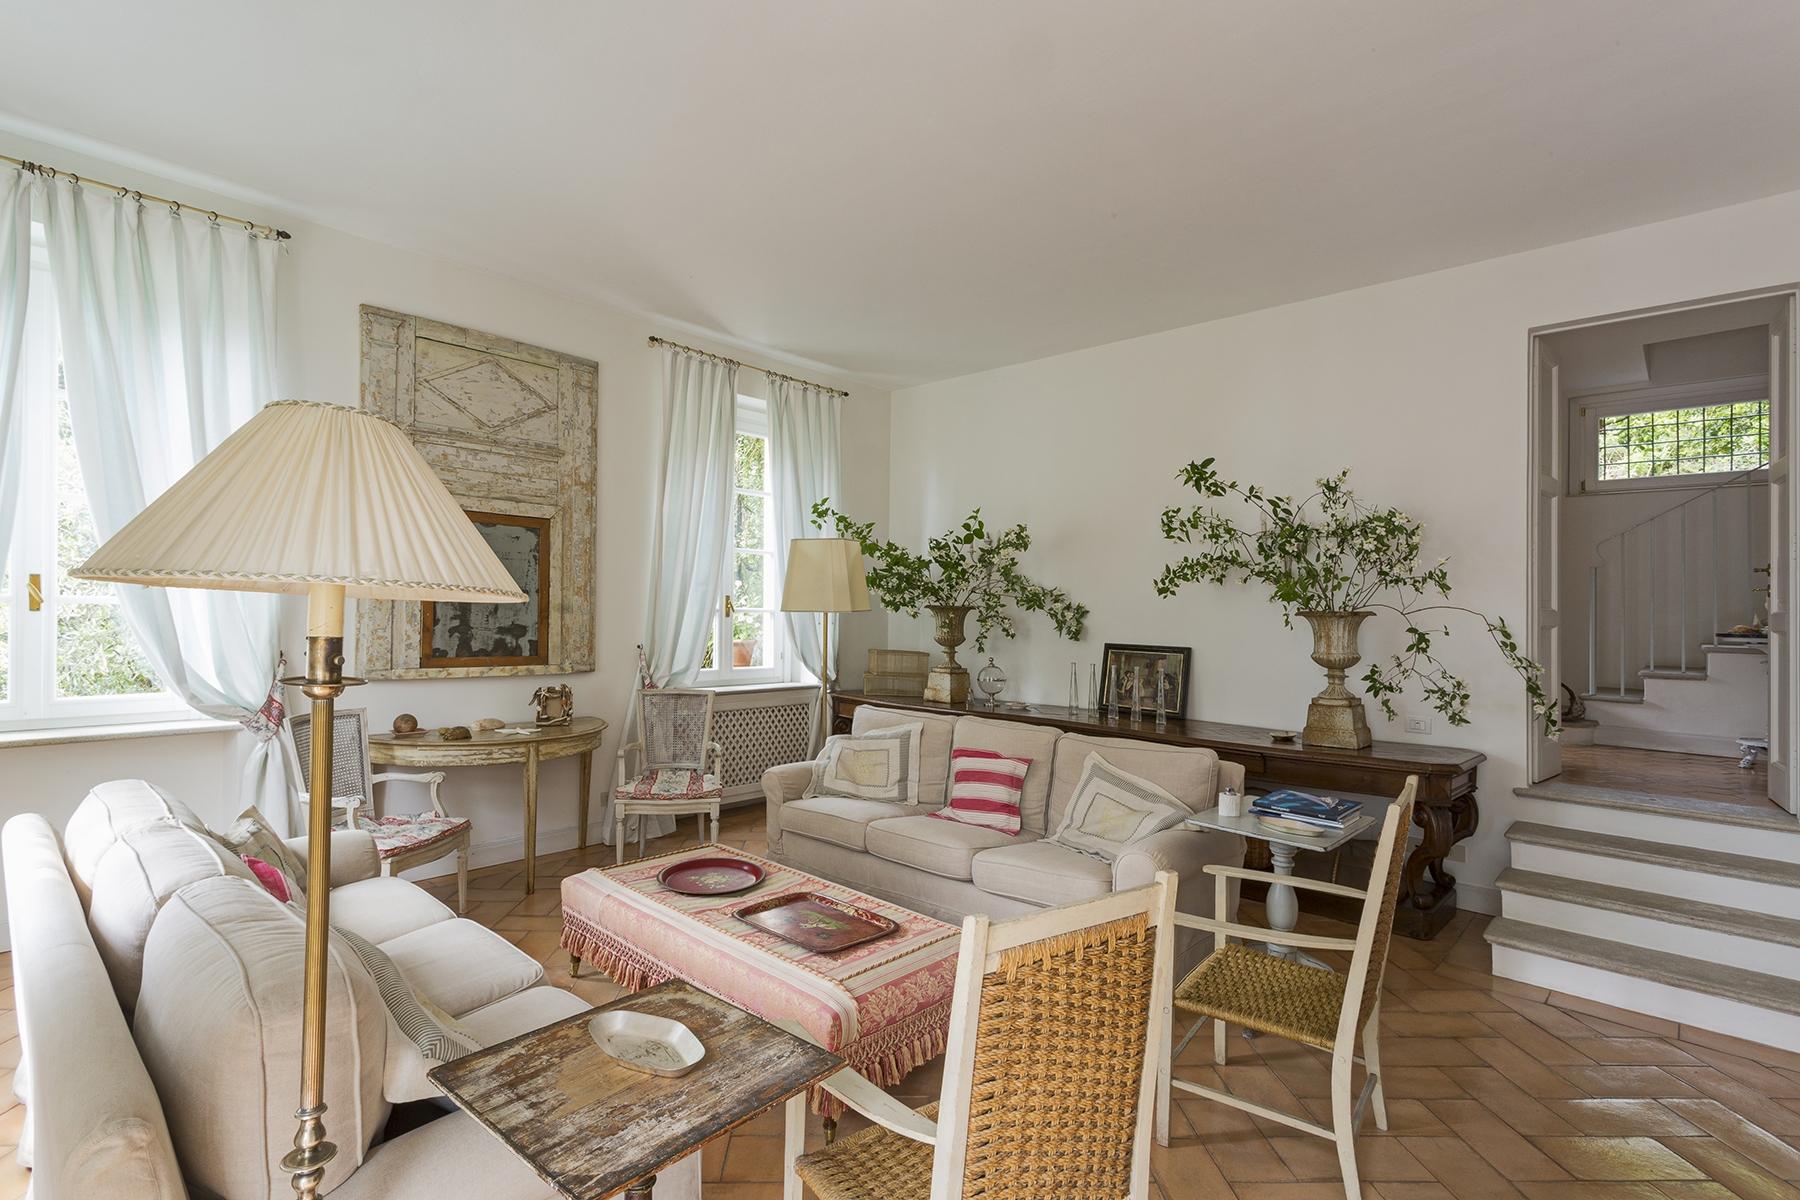 Villa in Vendita a Santa Margherita Ligure: 5 locali, 580 mq - Foto 14